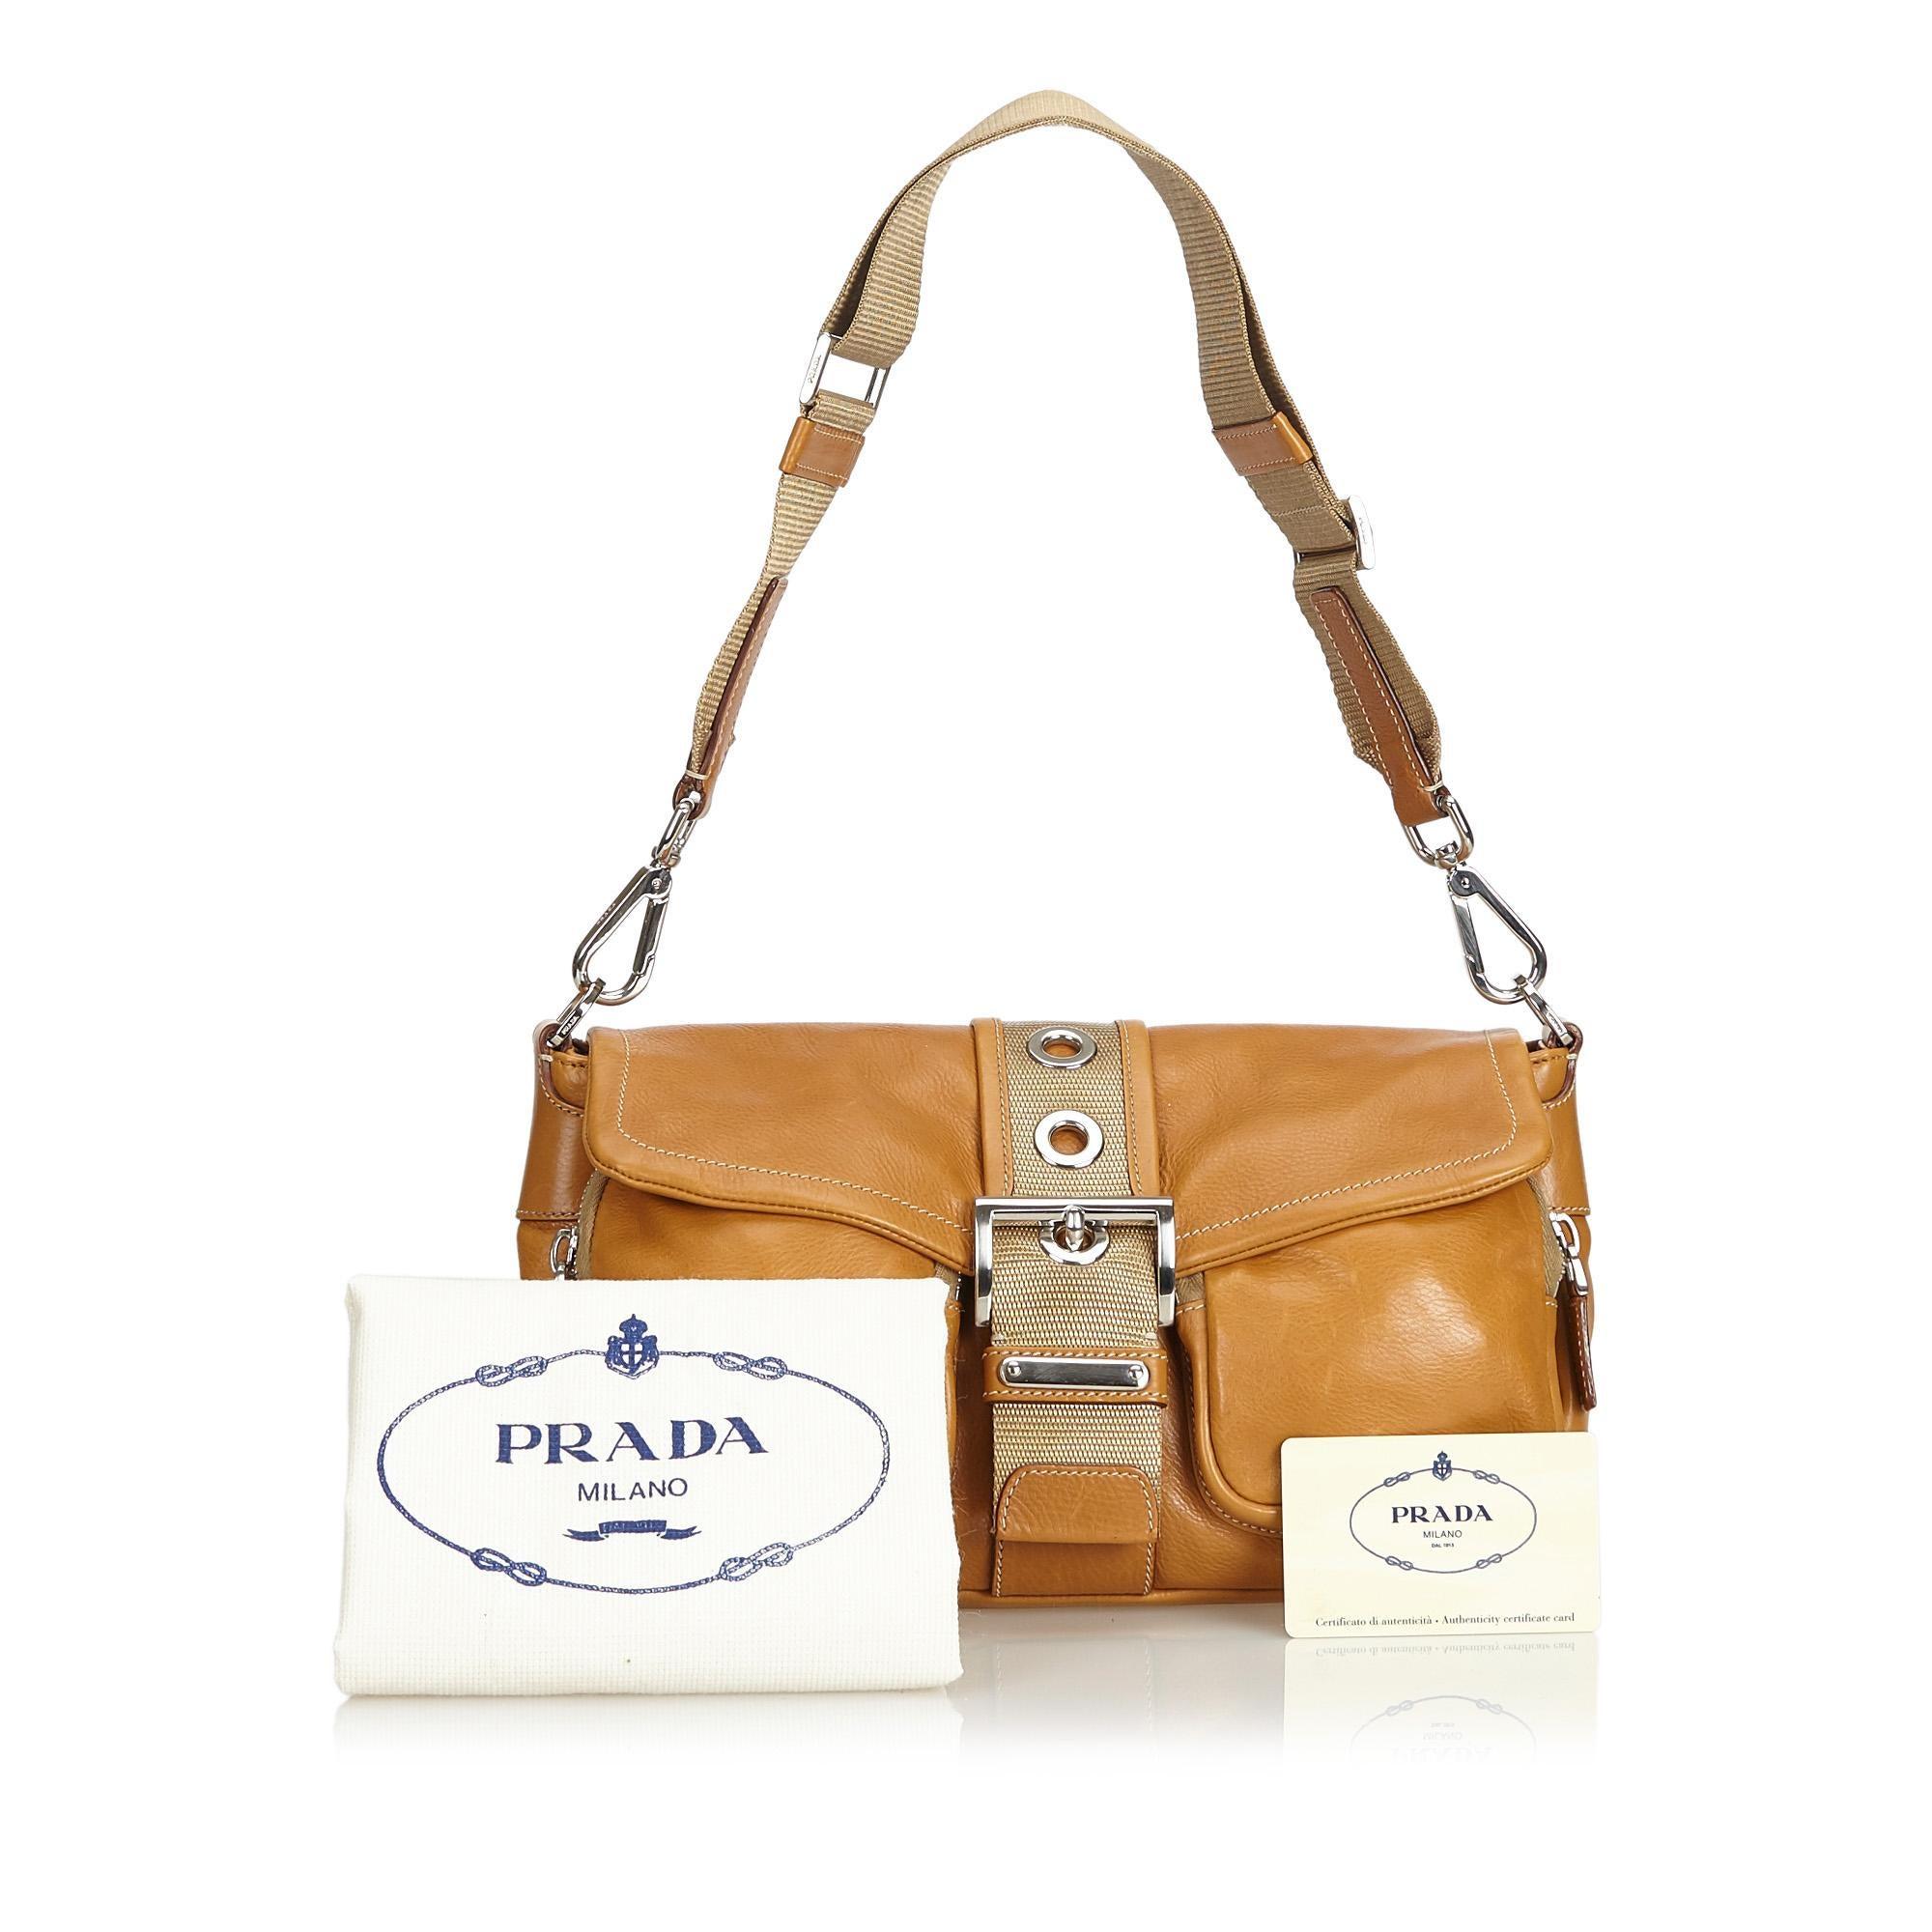 65361c9114c1 Prada Brown Leather Bagutte Bag at 1stdibs